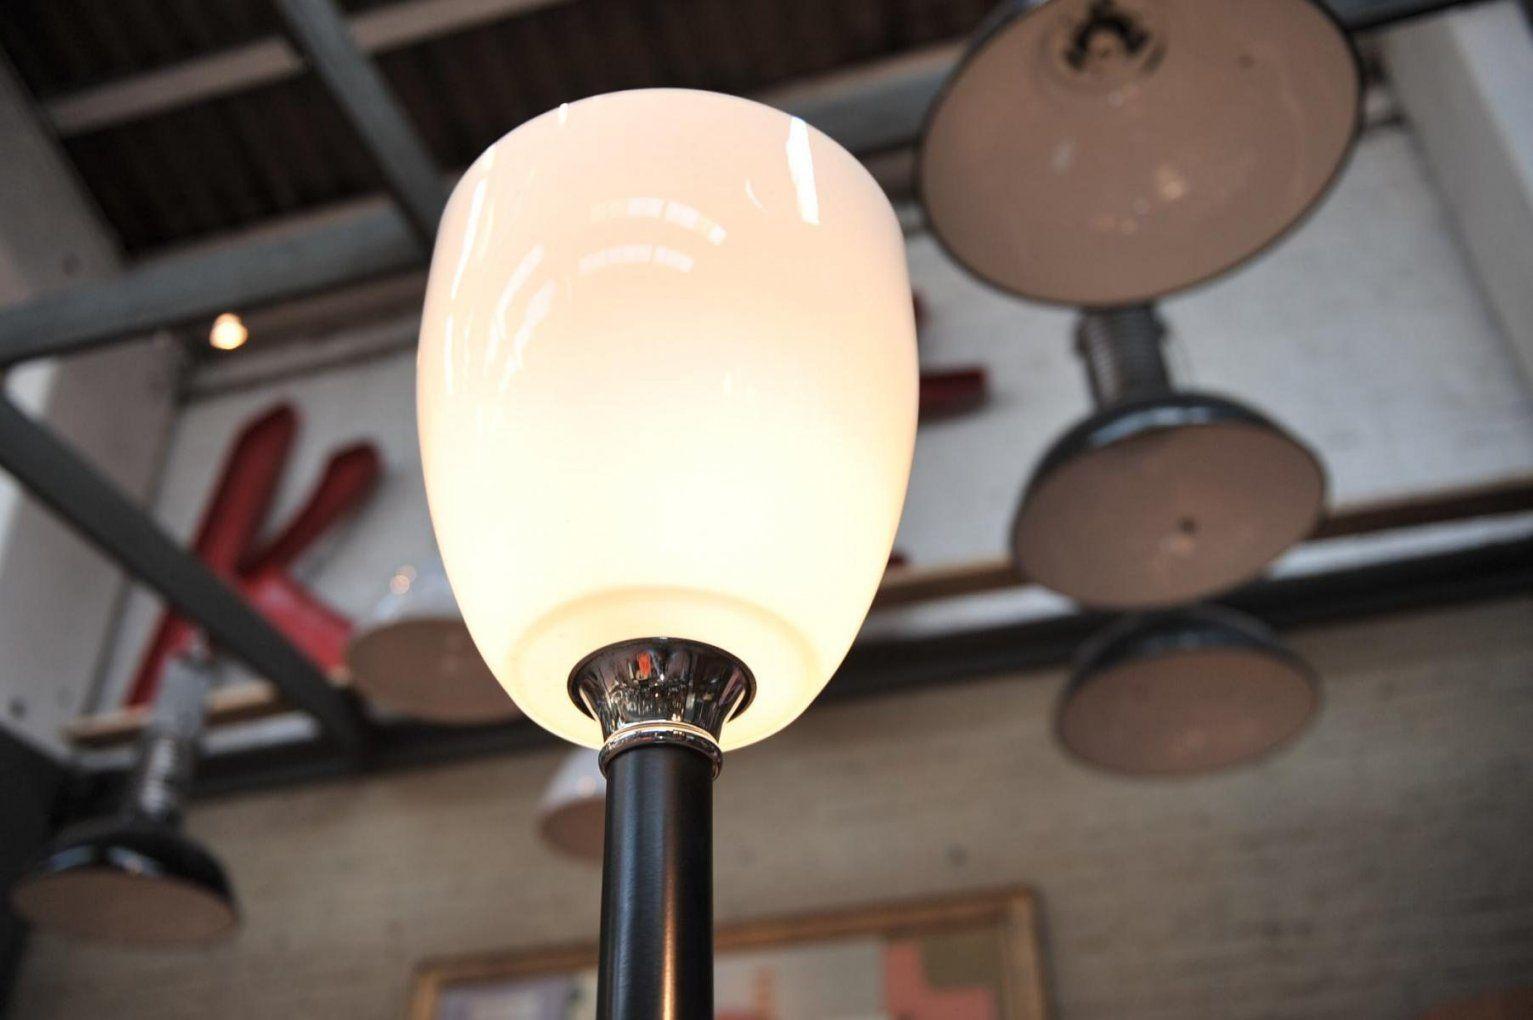 Glas Lampenschirm Schaffen Schones Ambiente Lampenschirm Stehlampe von Glas Lampenschirm Für Stehlampe Bild